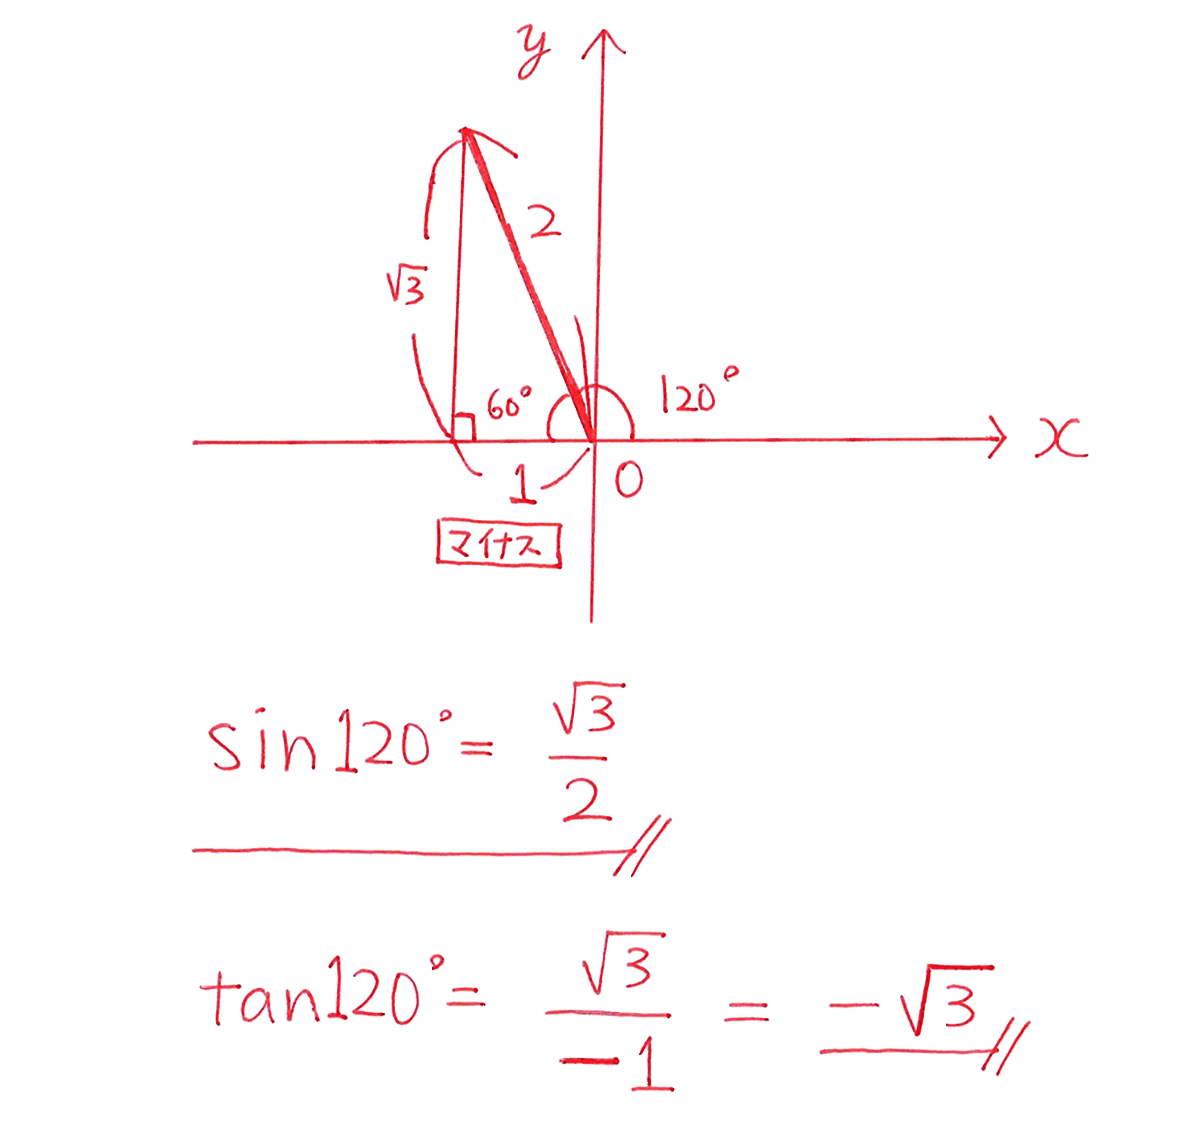 高校数学Ⅰ 三角比11 練習の答え